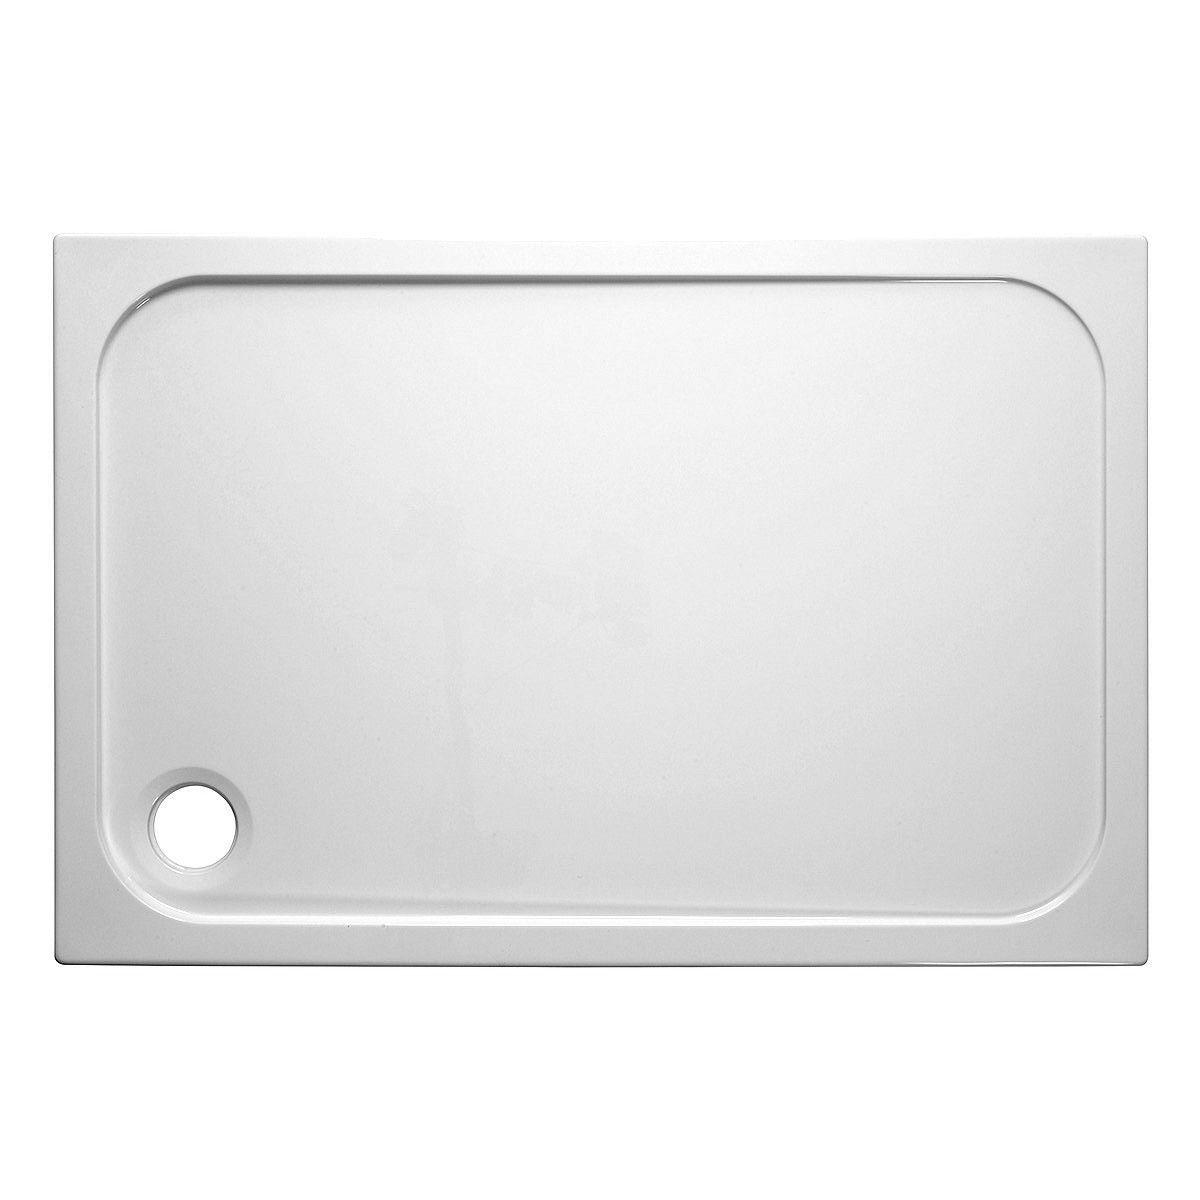 simpsons rectangular 45mm stone resin shower tray uk. Black Bedroom Furniture Sets. Home Design Ideas